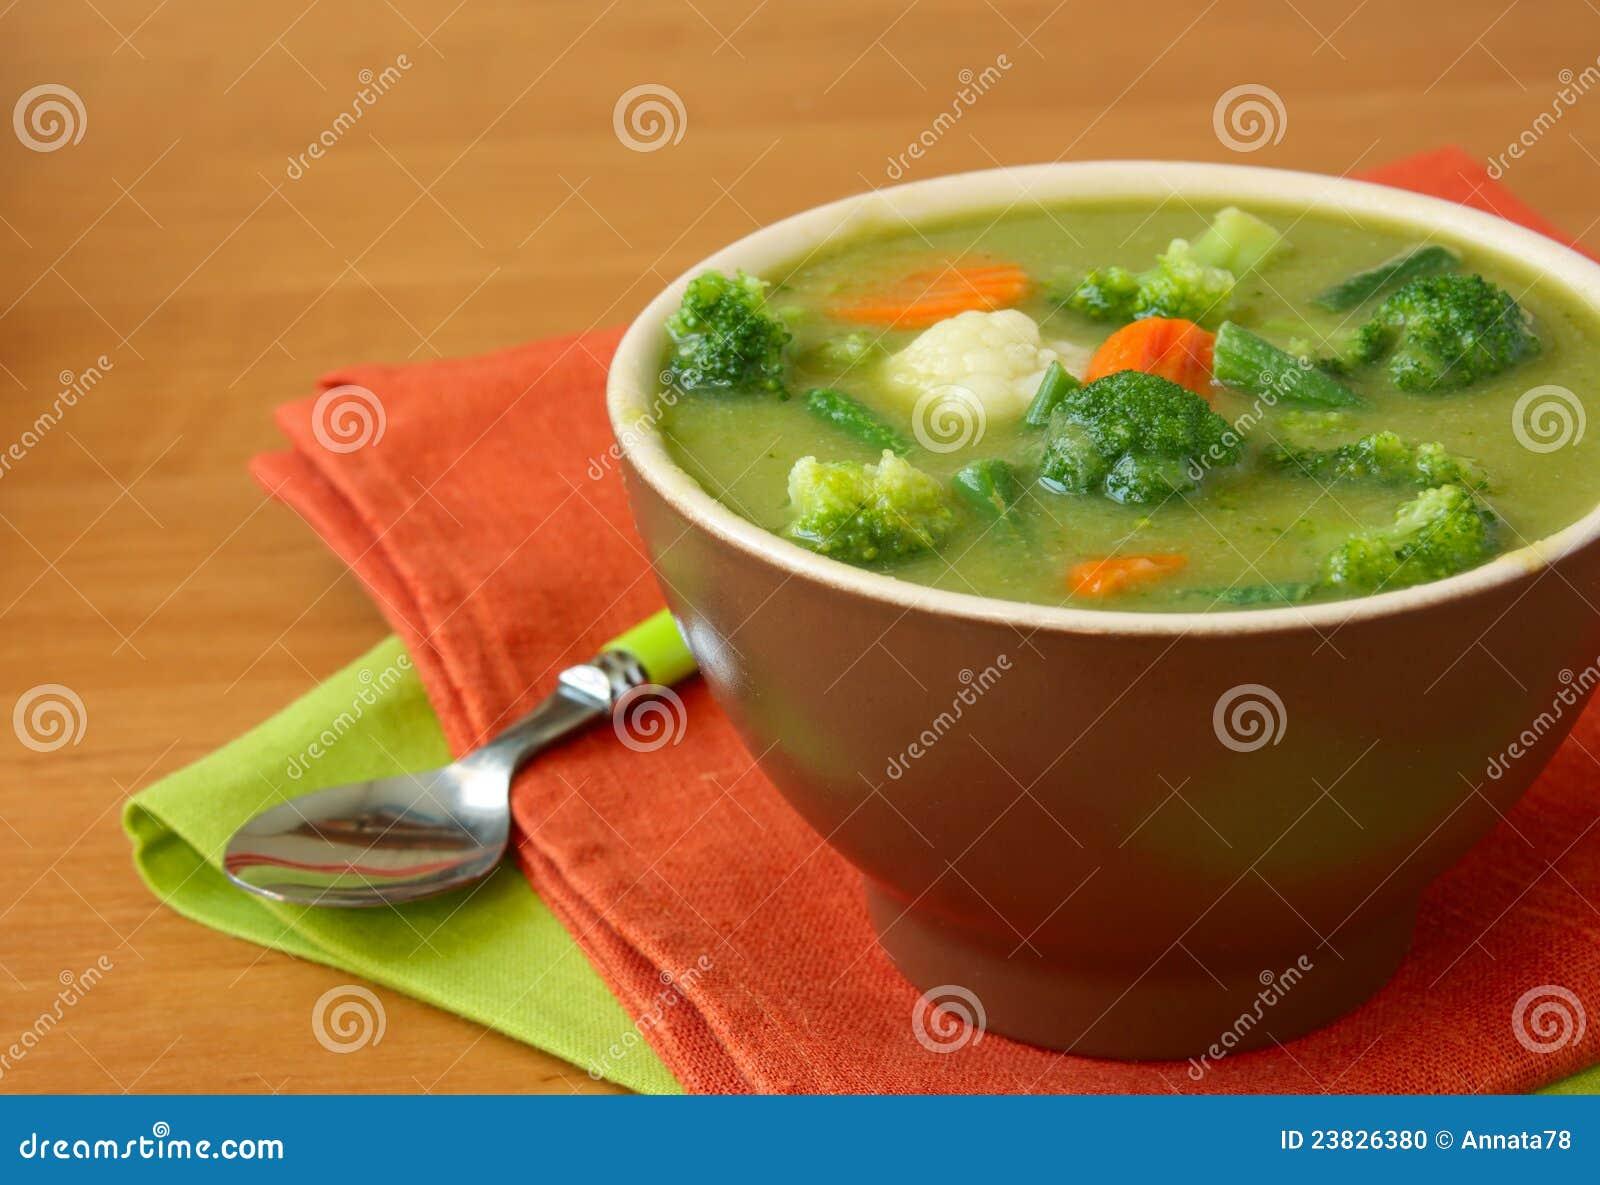 Soupgrönsakvegetarian